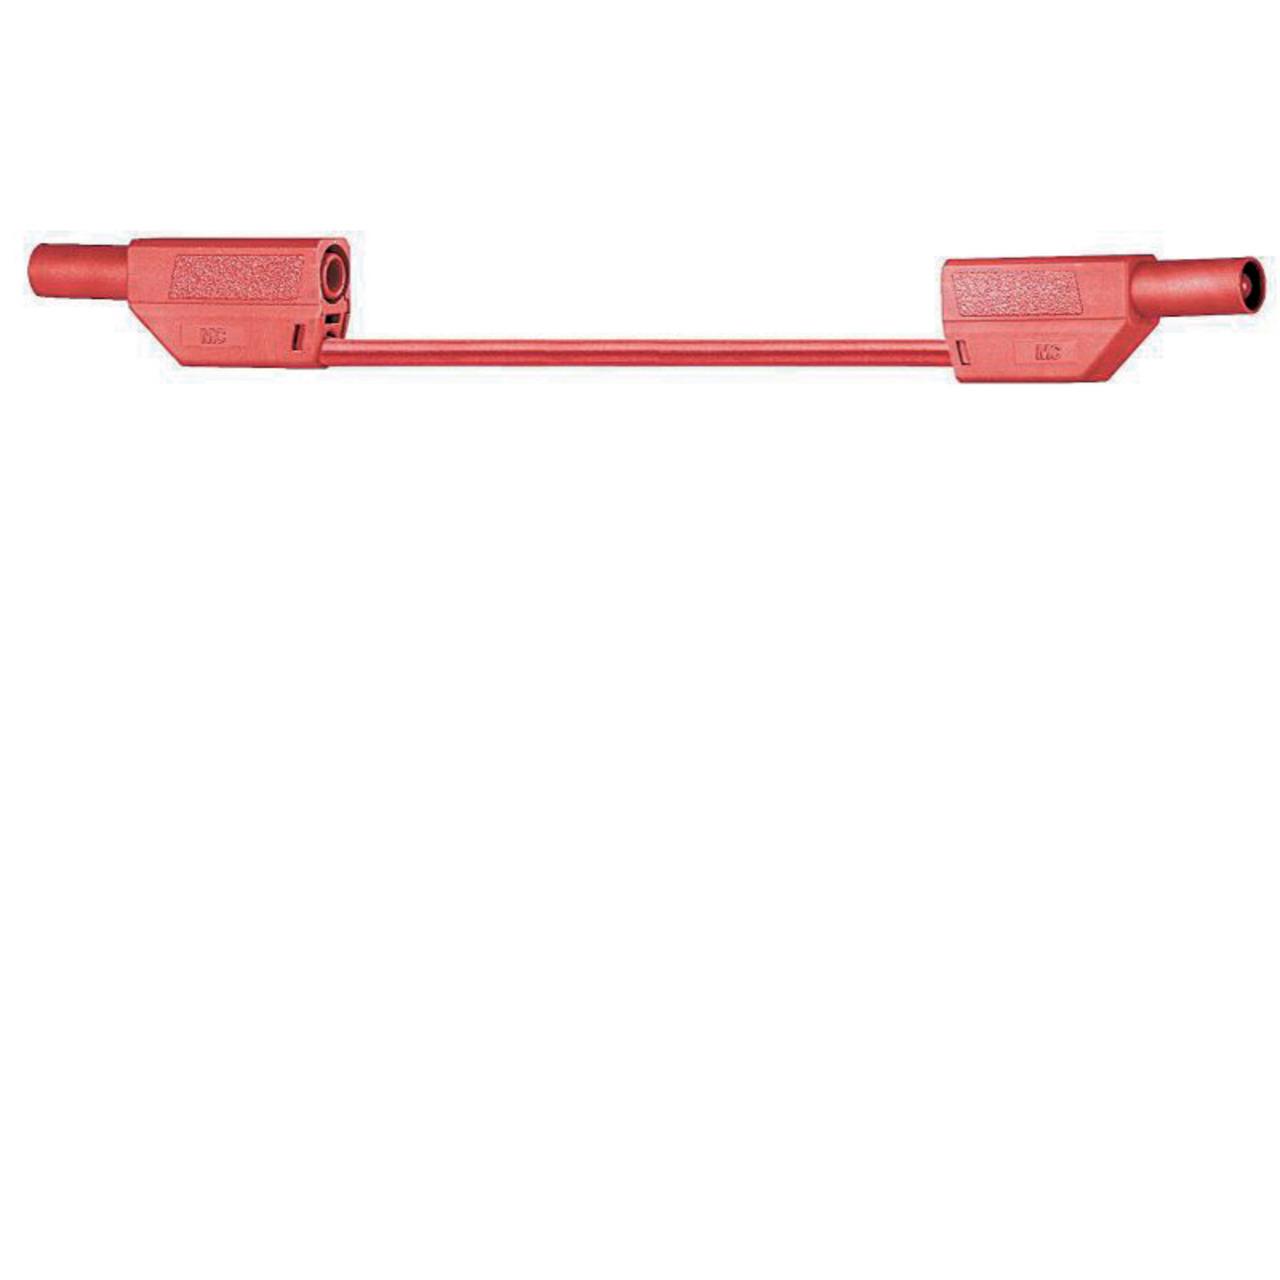 Sicherheitsmessleitungen in Silikon (SLK410-E-SIL) 4mm- 19A- 2m- rot